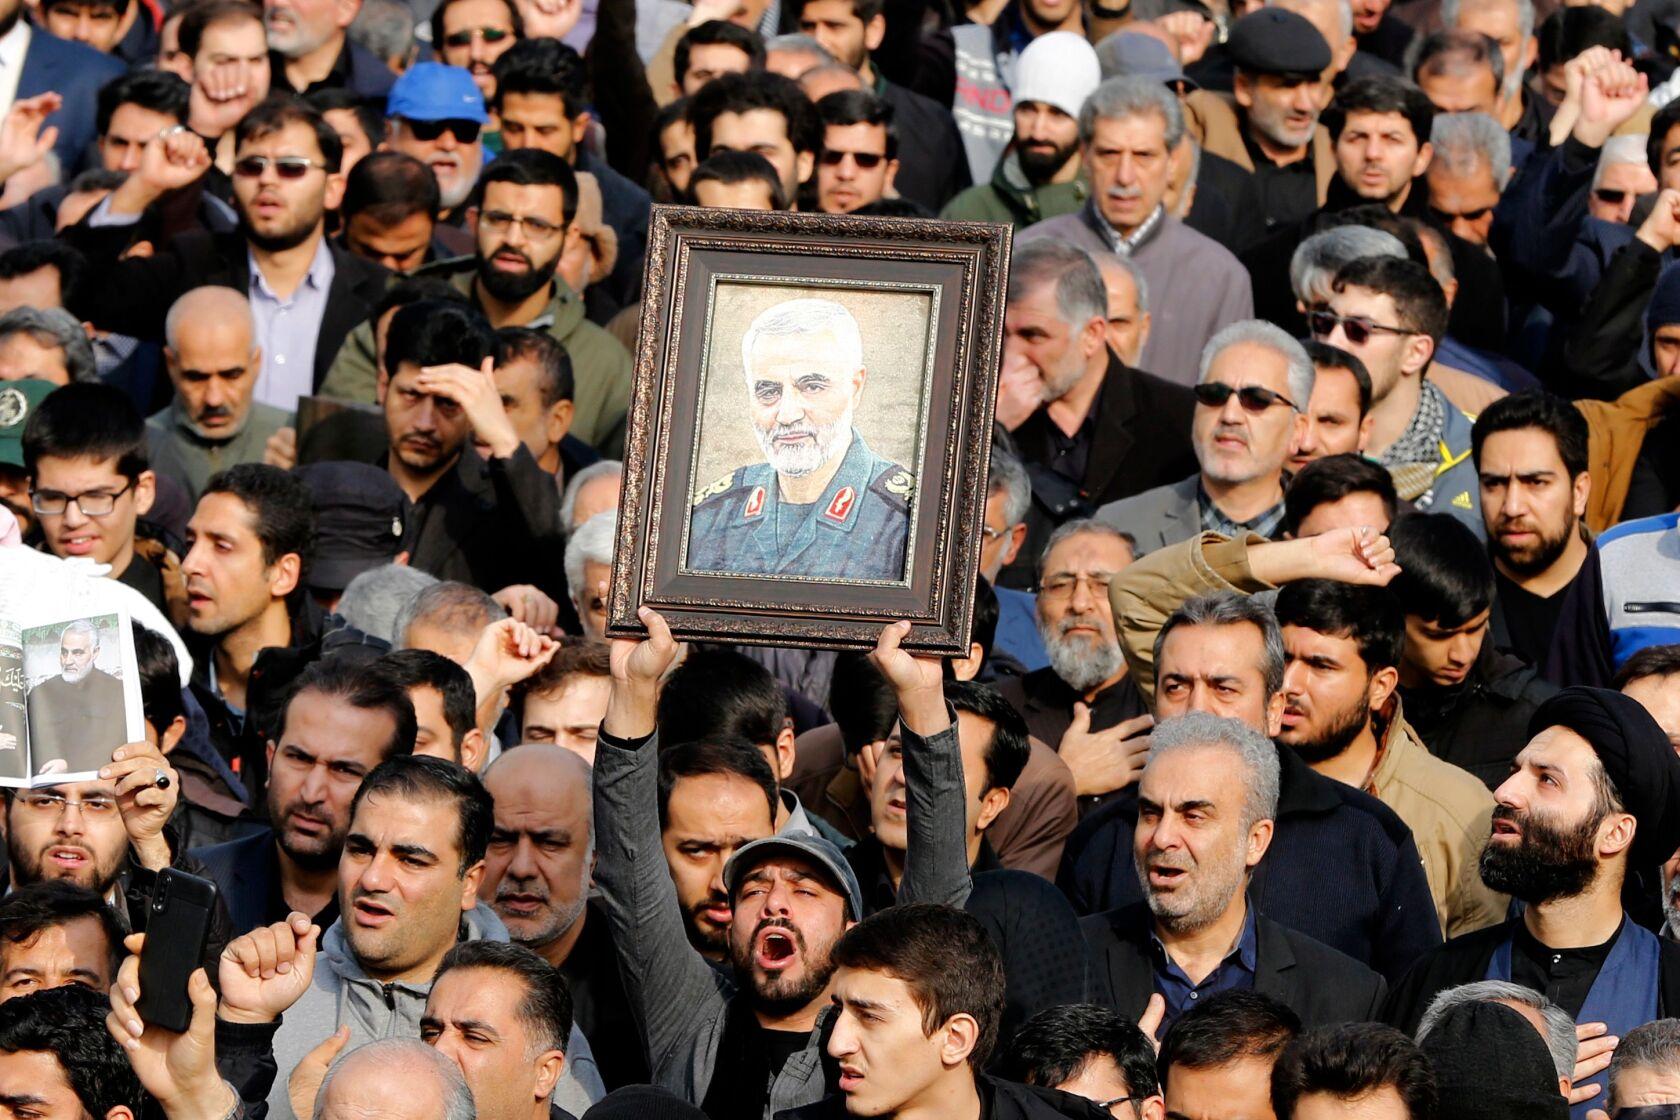 Manifestanti a Teheran marciano per la morte del generale Soleimani. Credits to: Abedin Taherkenareh/EPA.